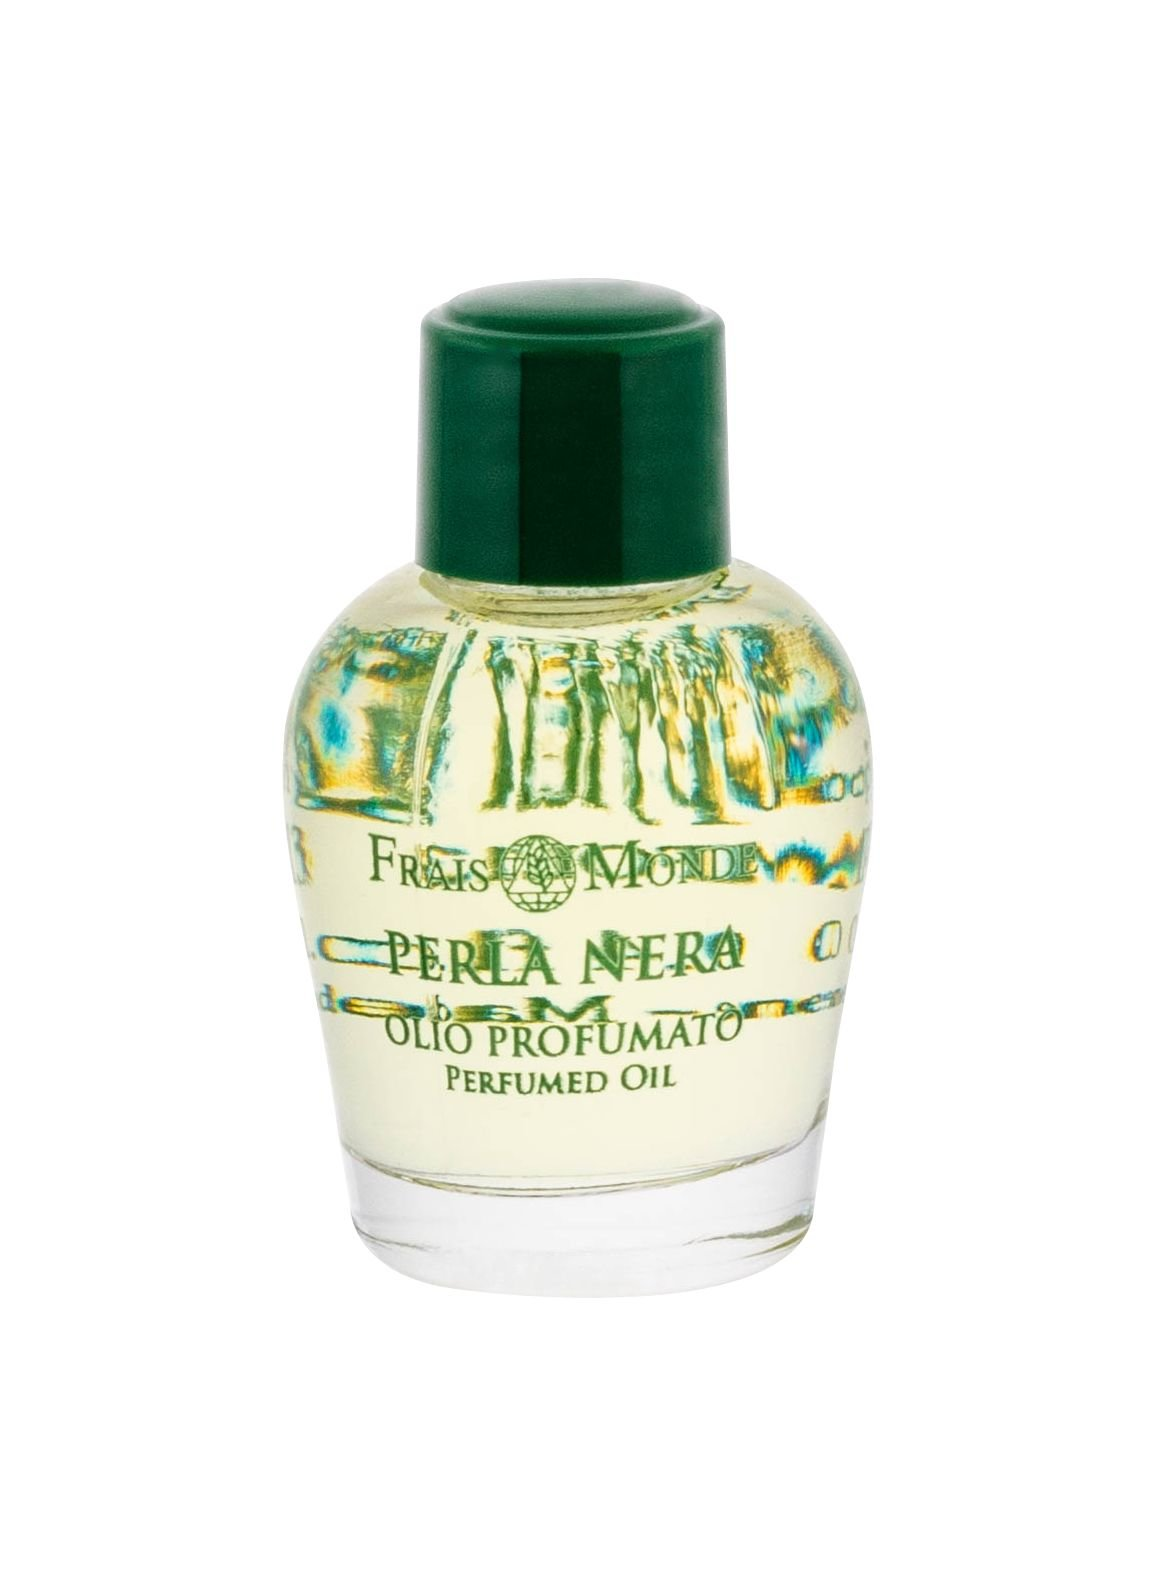 Frais Monde Perla Nera Perfumed Oil Perfumed oil 12ml